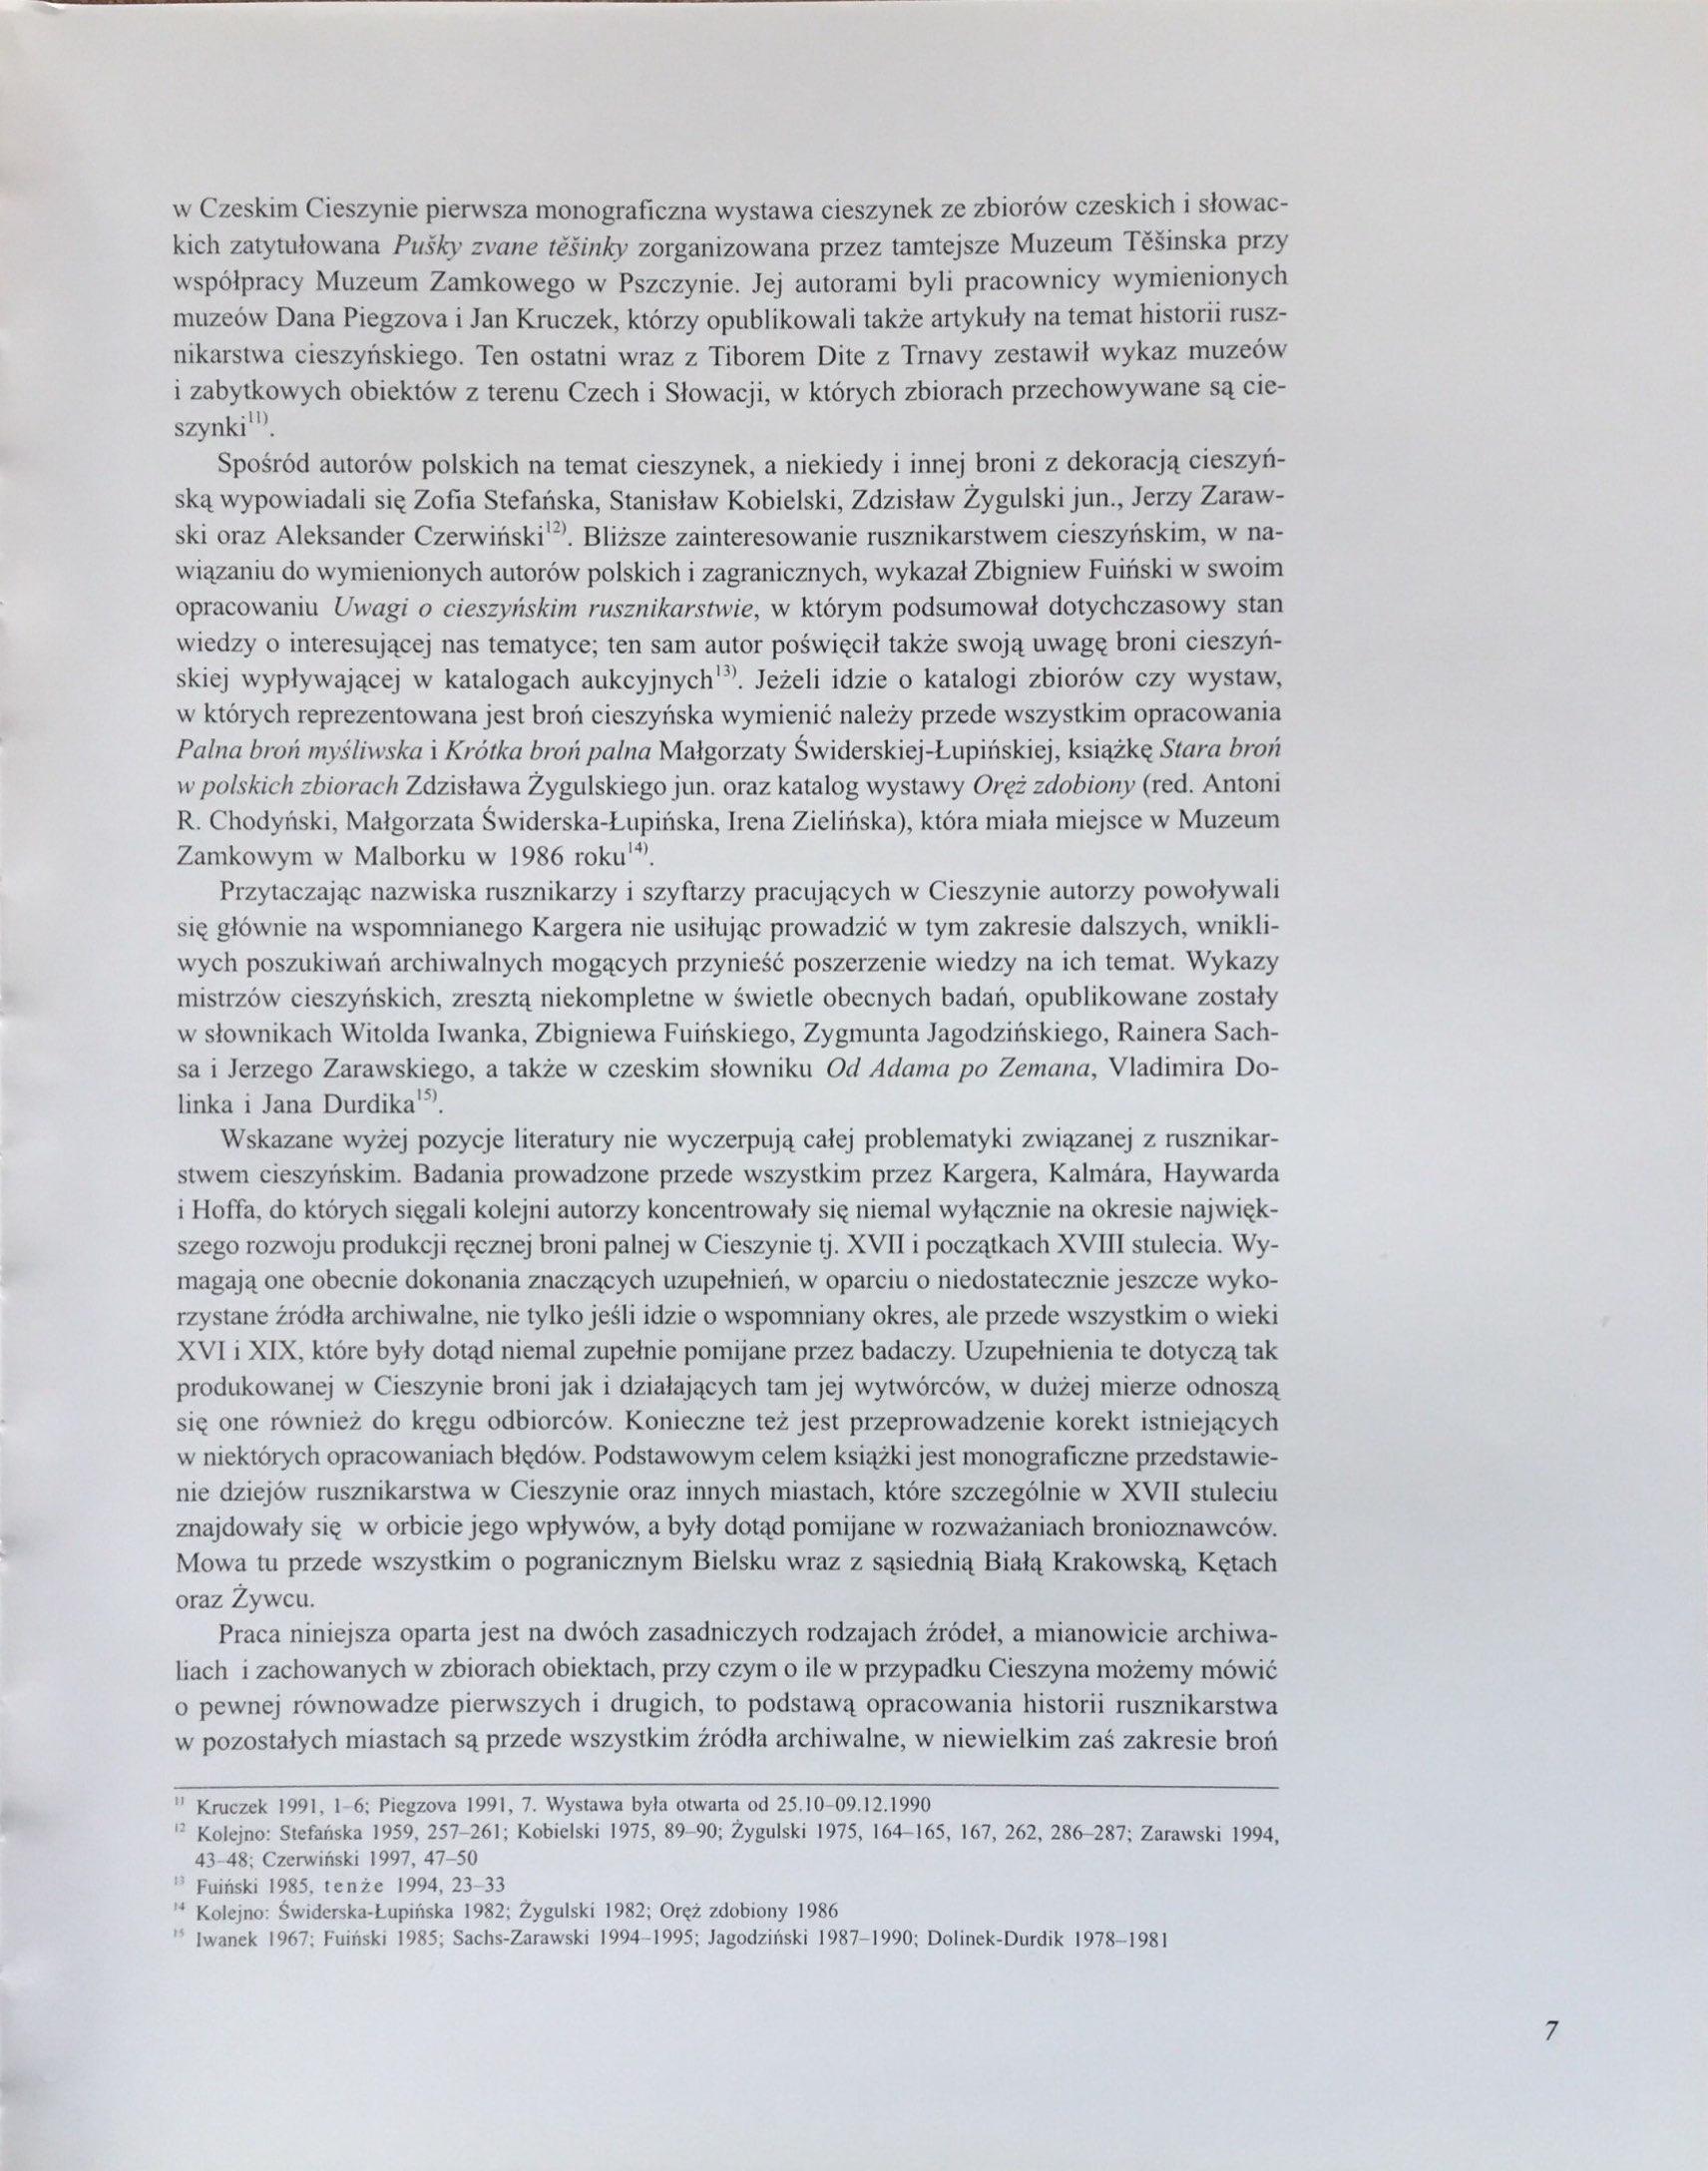 Nowy Dokument 10_7